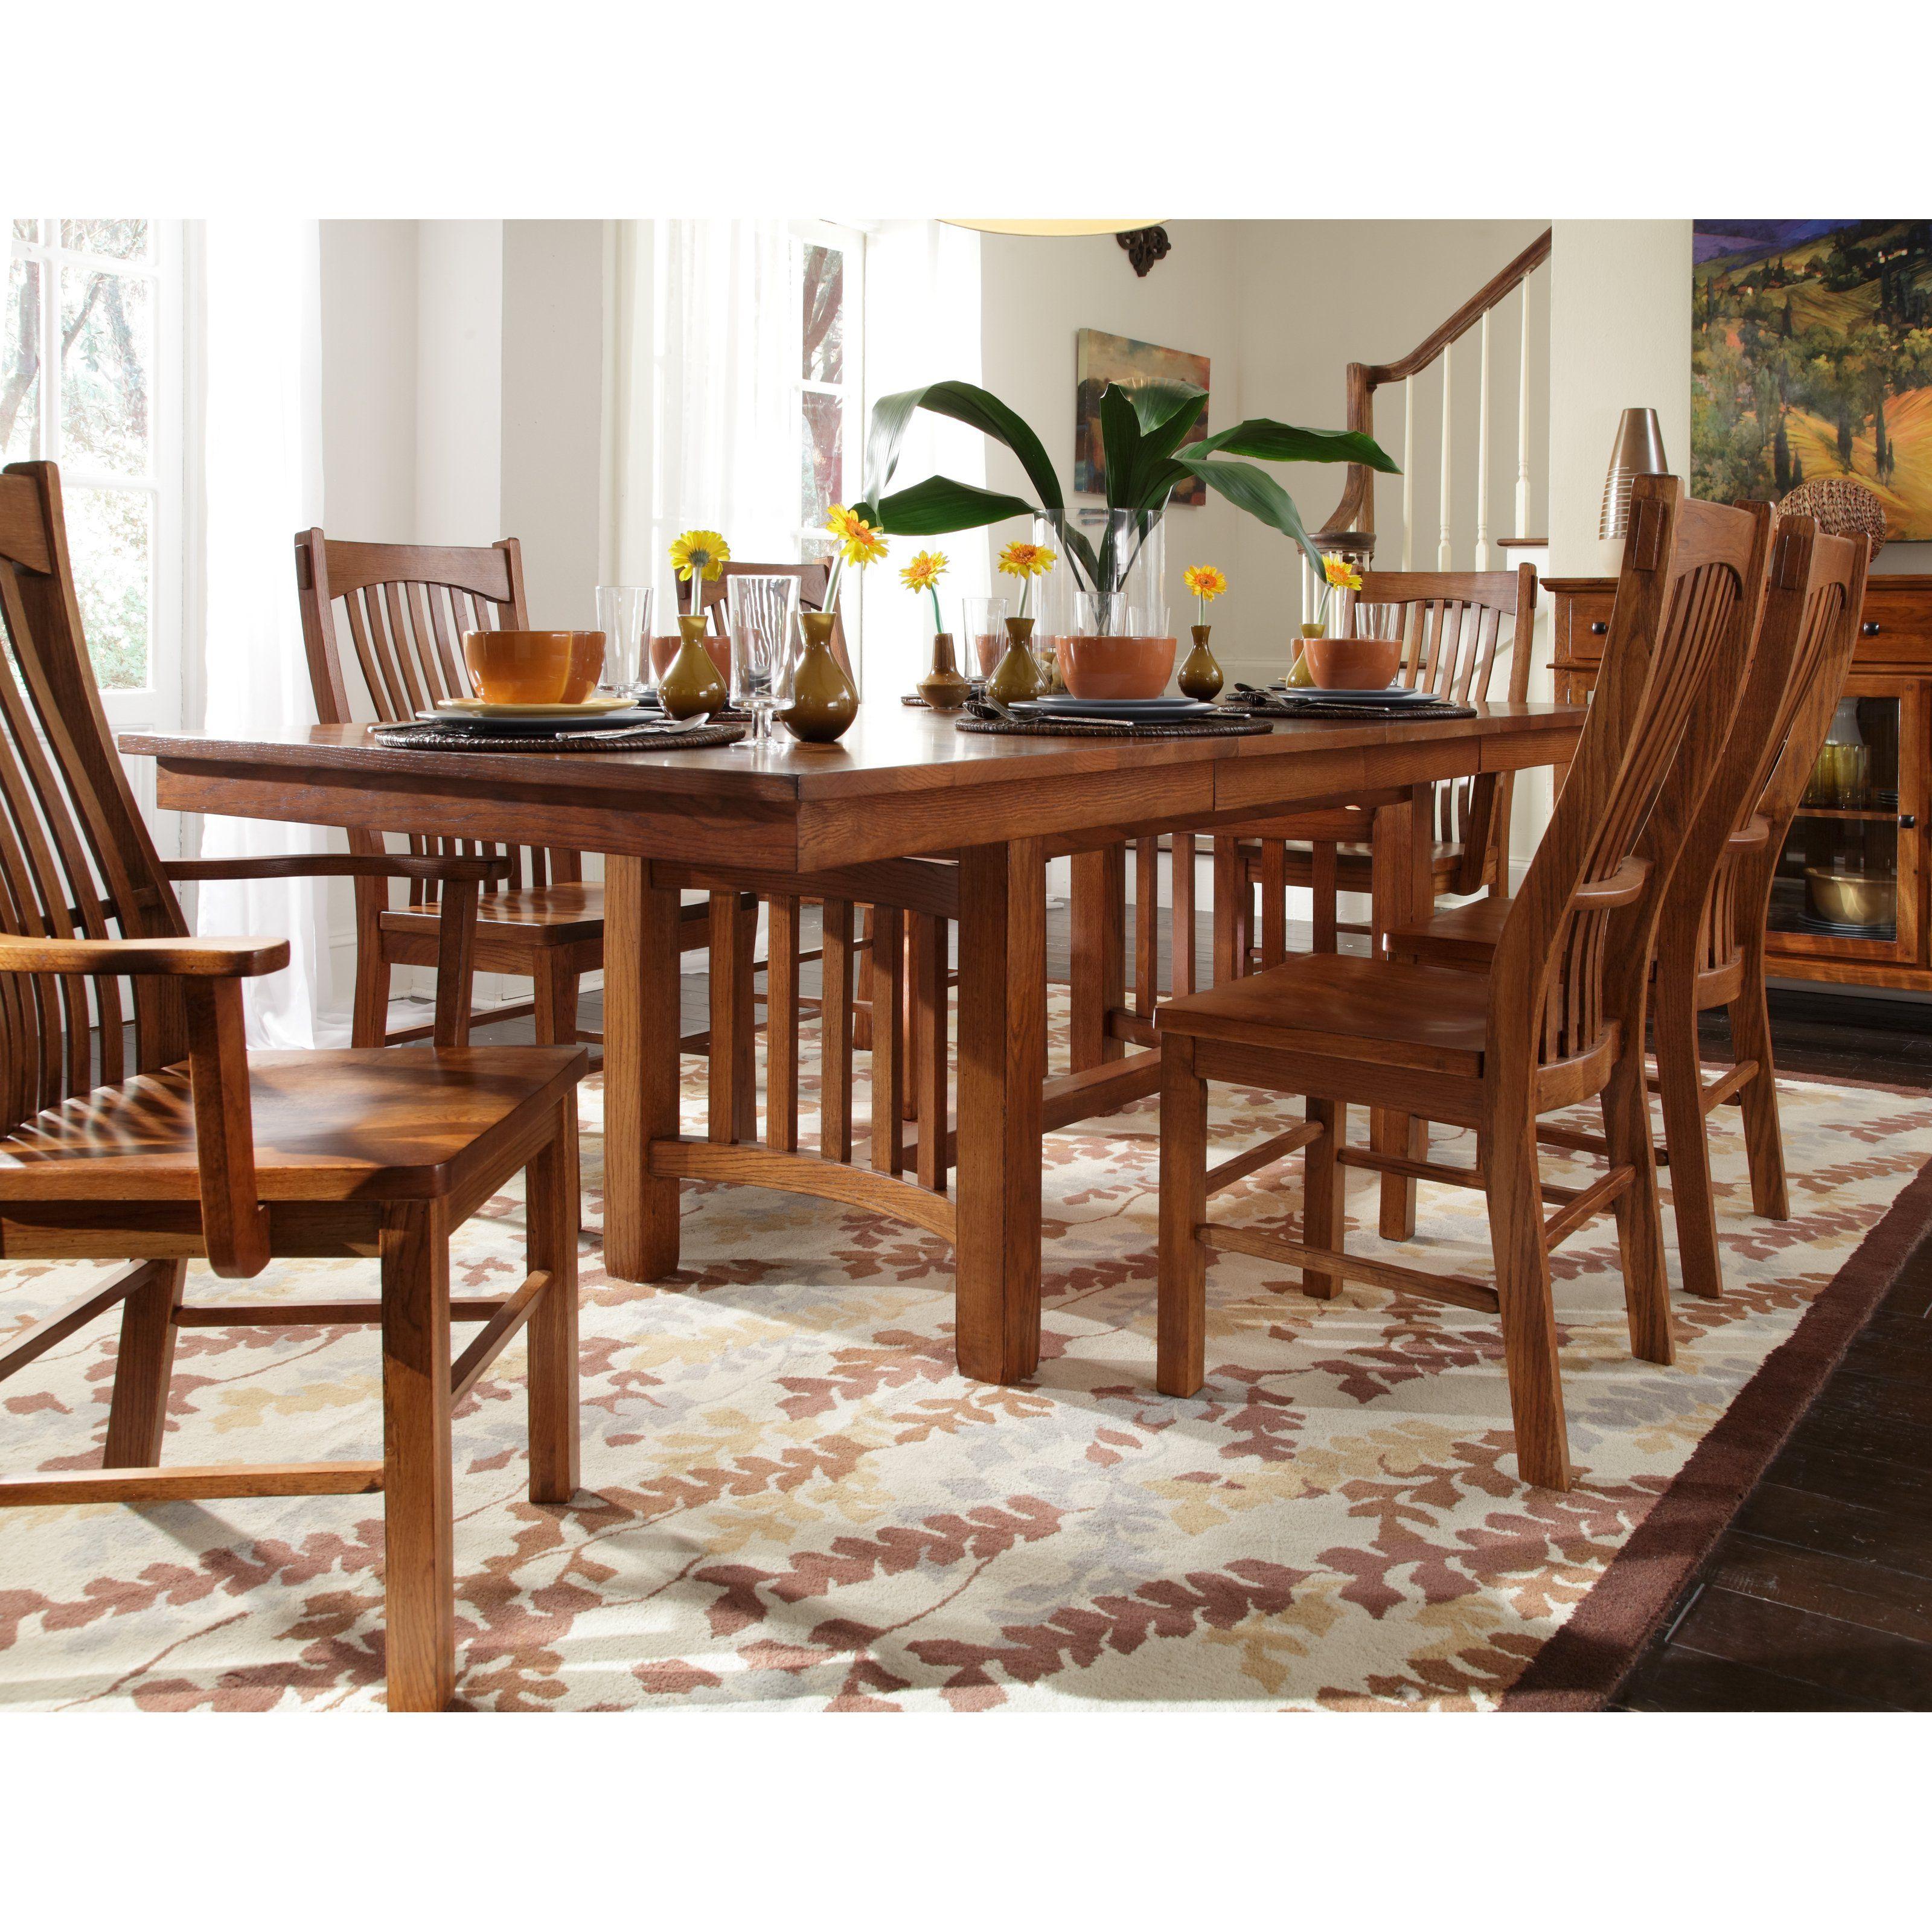 Laurelhurst Collection Aamerica Solid Wood Furniture Rustic